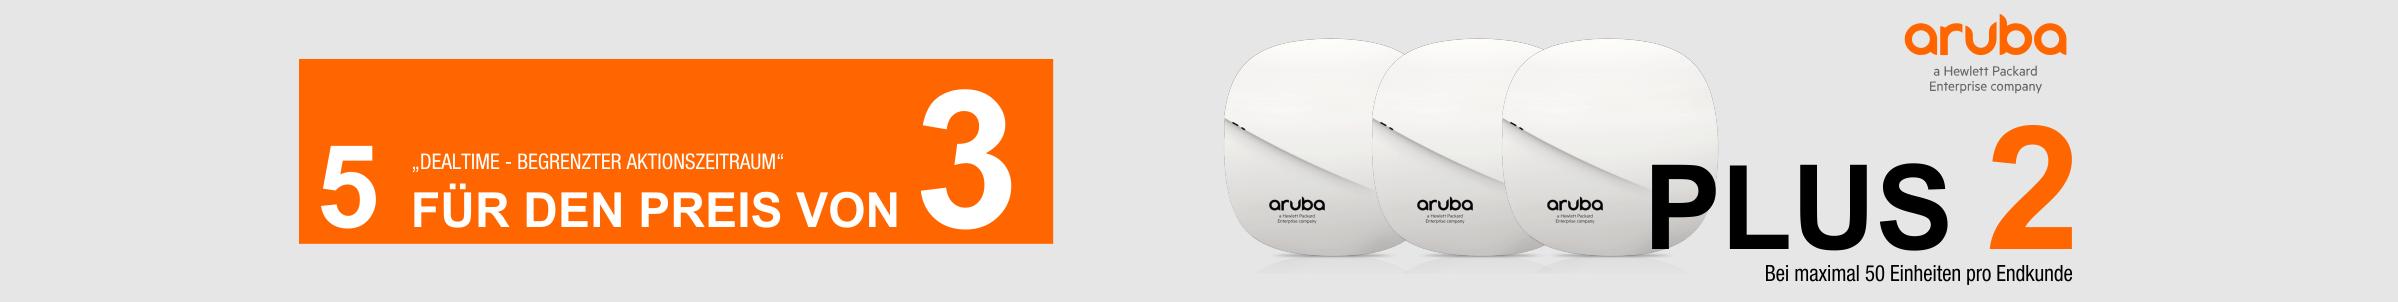 Aruba_CM_2018_2400_09_2018_XI